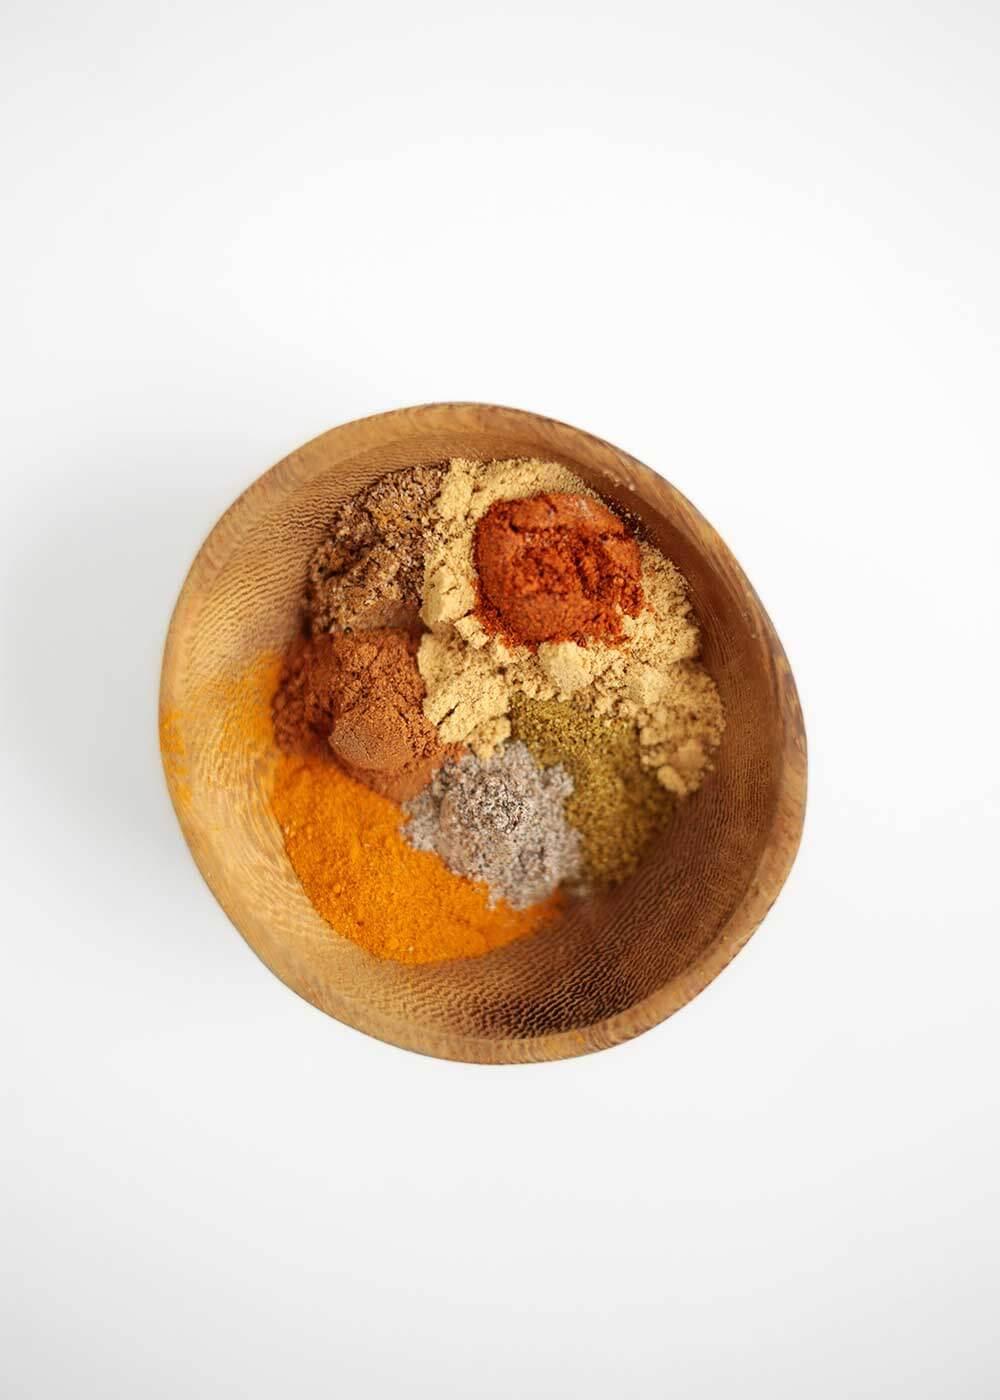 DIY Garam Masala from The Faux Martha